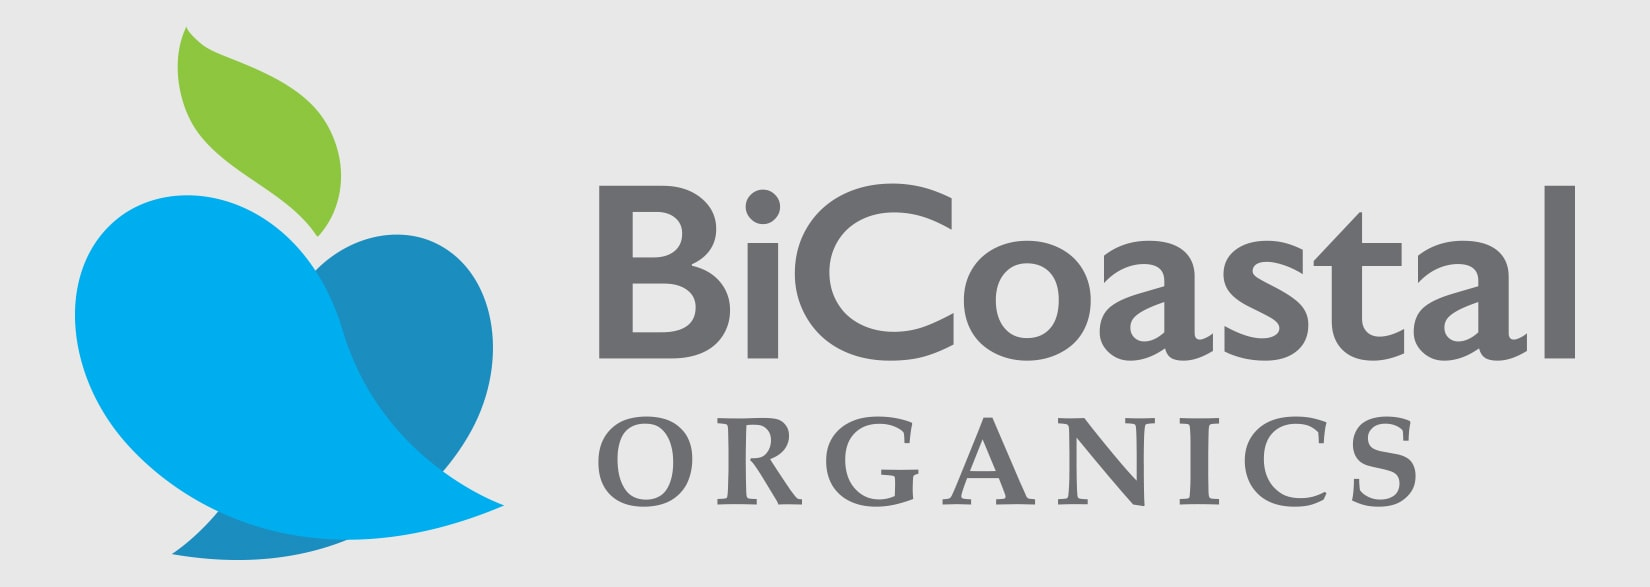 bicoastal logo design